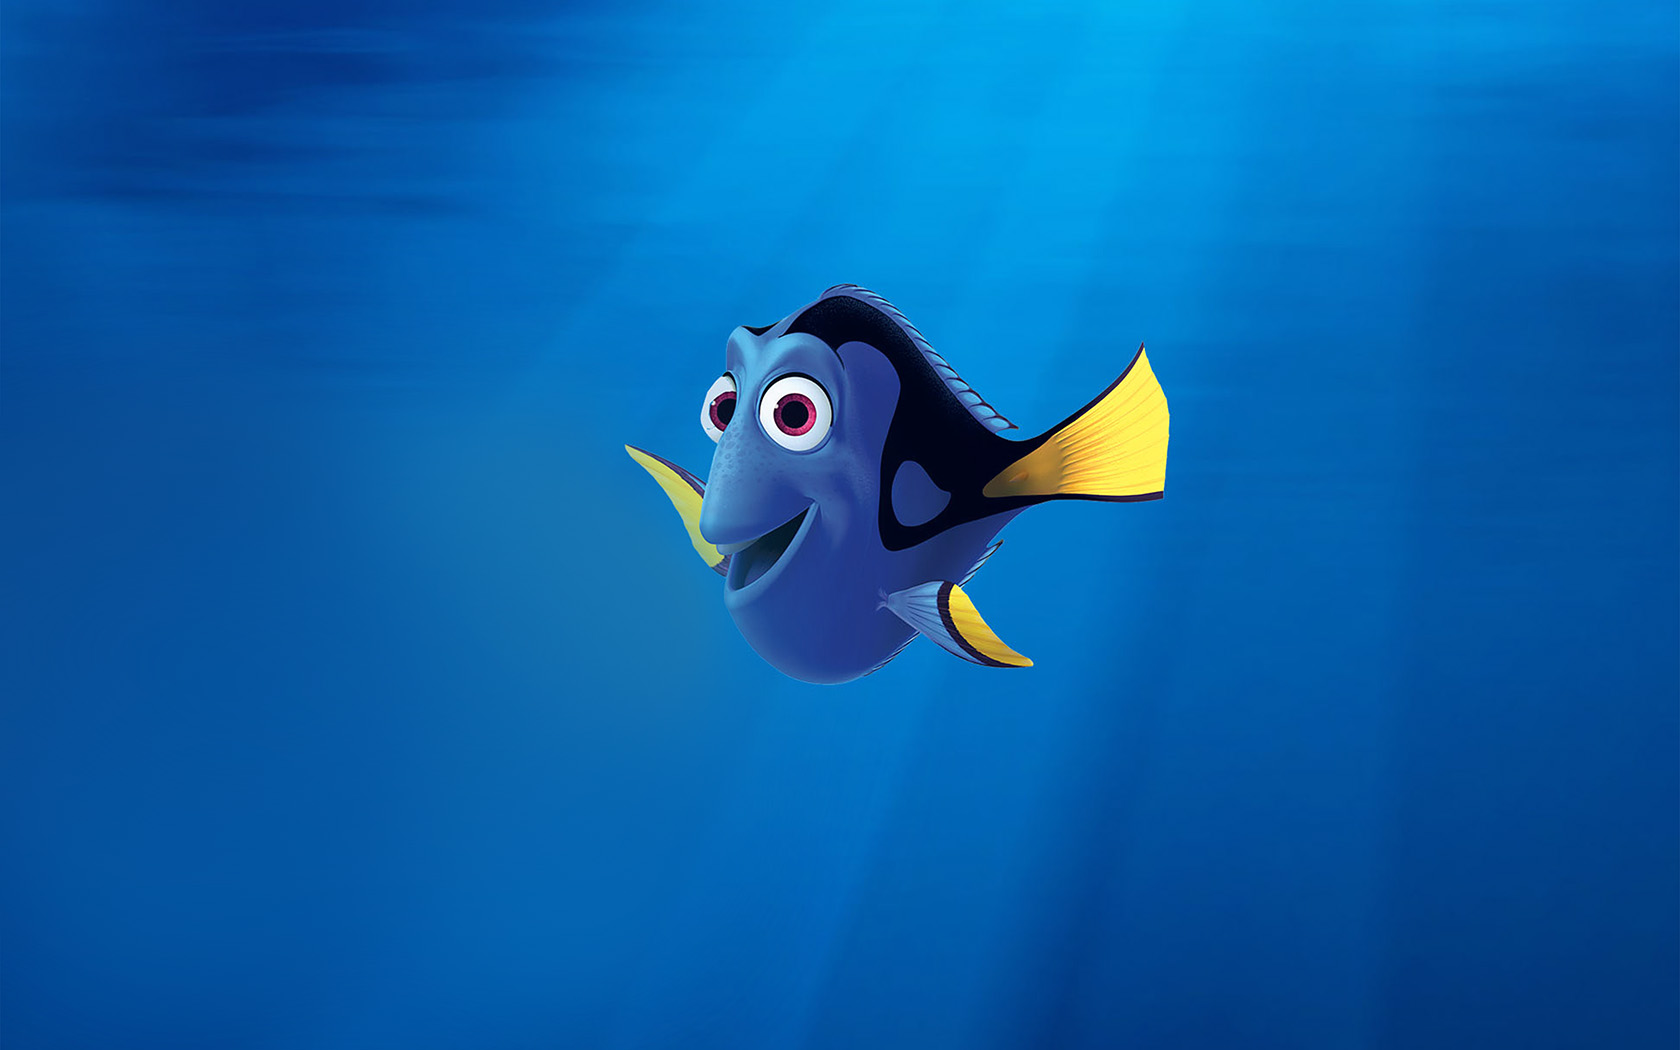 Free Fall Animal Wallpaper Aq99 Finding Nemo Dory Disney Art Wallpaper